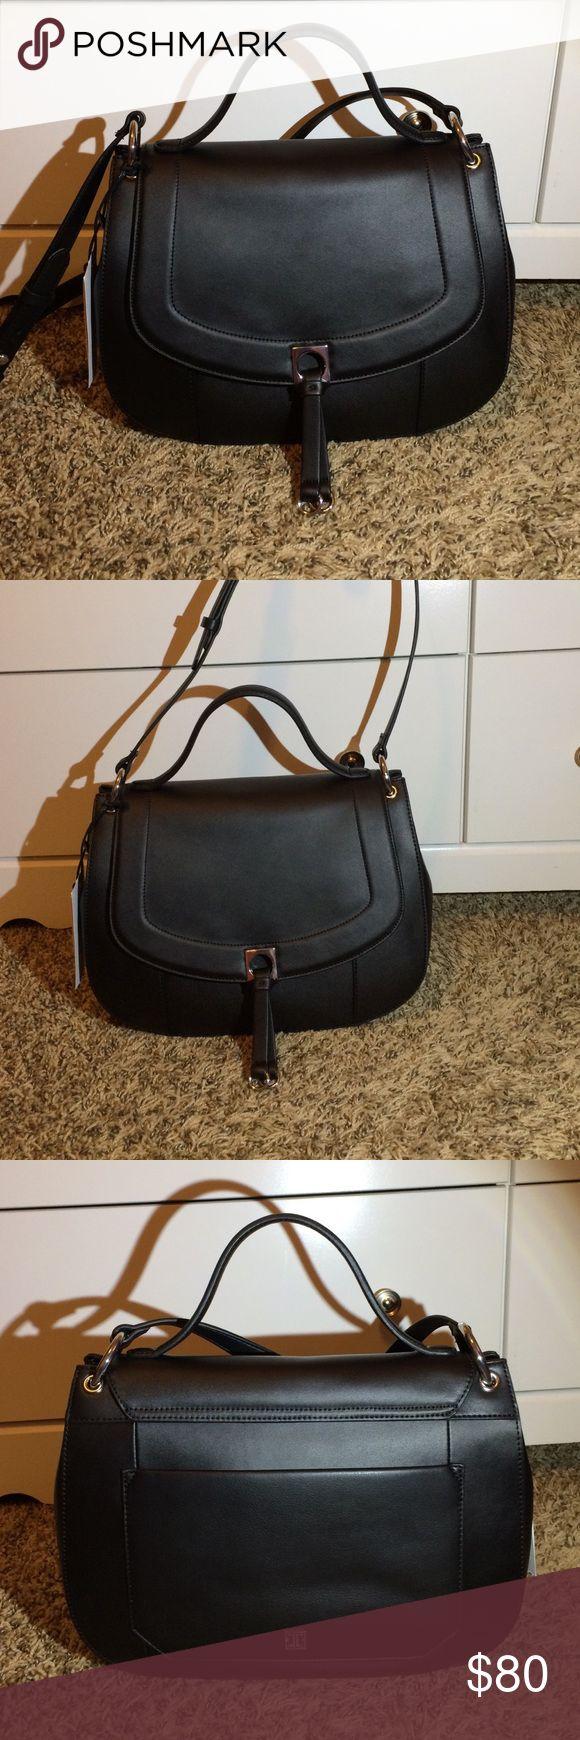 Ivanka Trump Claudia bag Ivank Trump Claudia handbag black leather absolutely gorgeous new with tags Ivanka Trump Bags Shoulder Bags